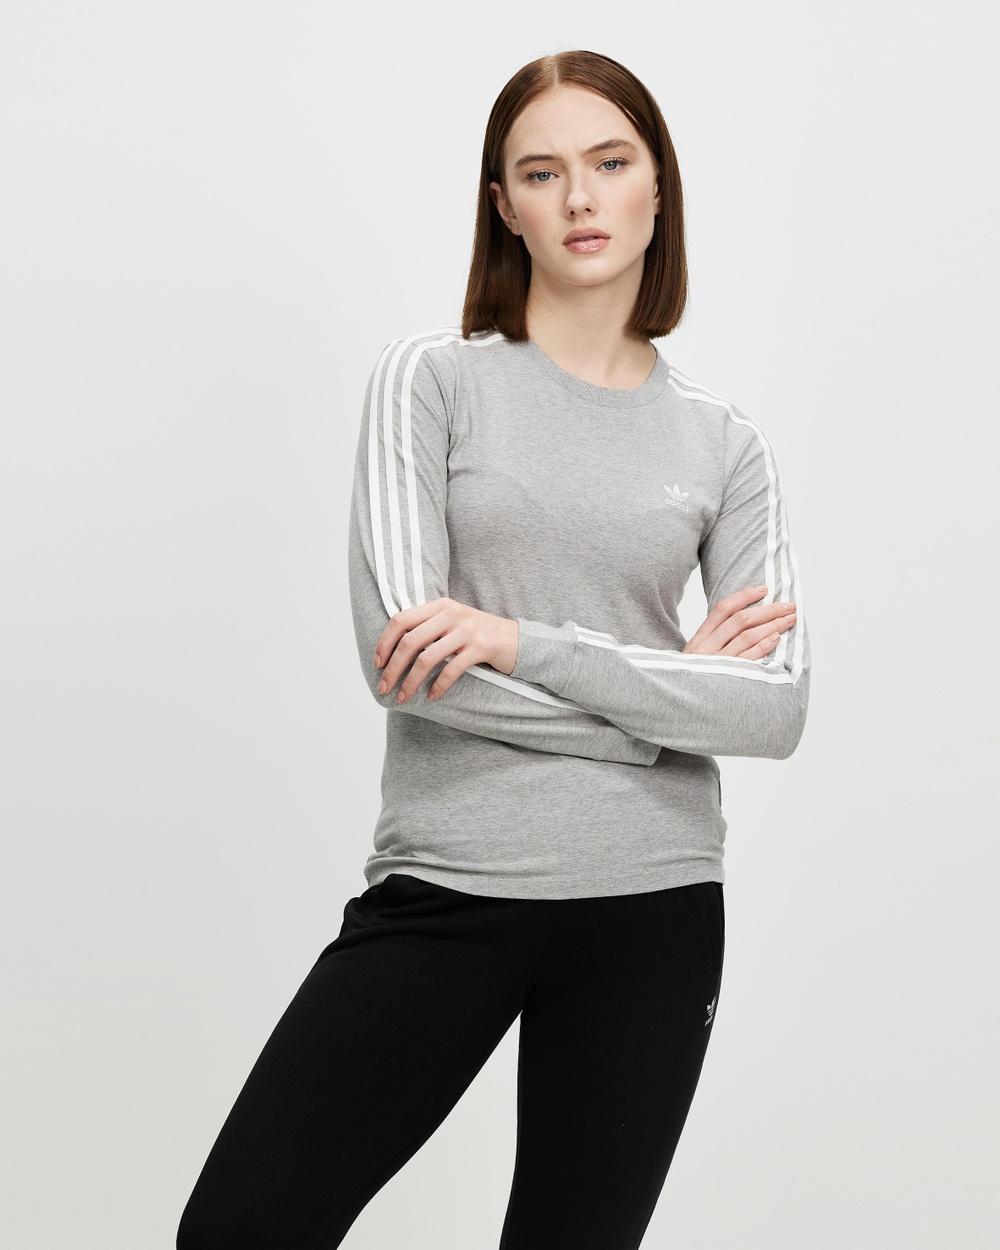 adidas Originals 3 Stripes Long Sleeve T-Shirts Medium Grey Heather 3-Stripes